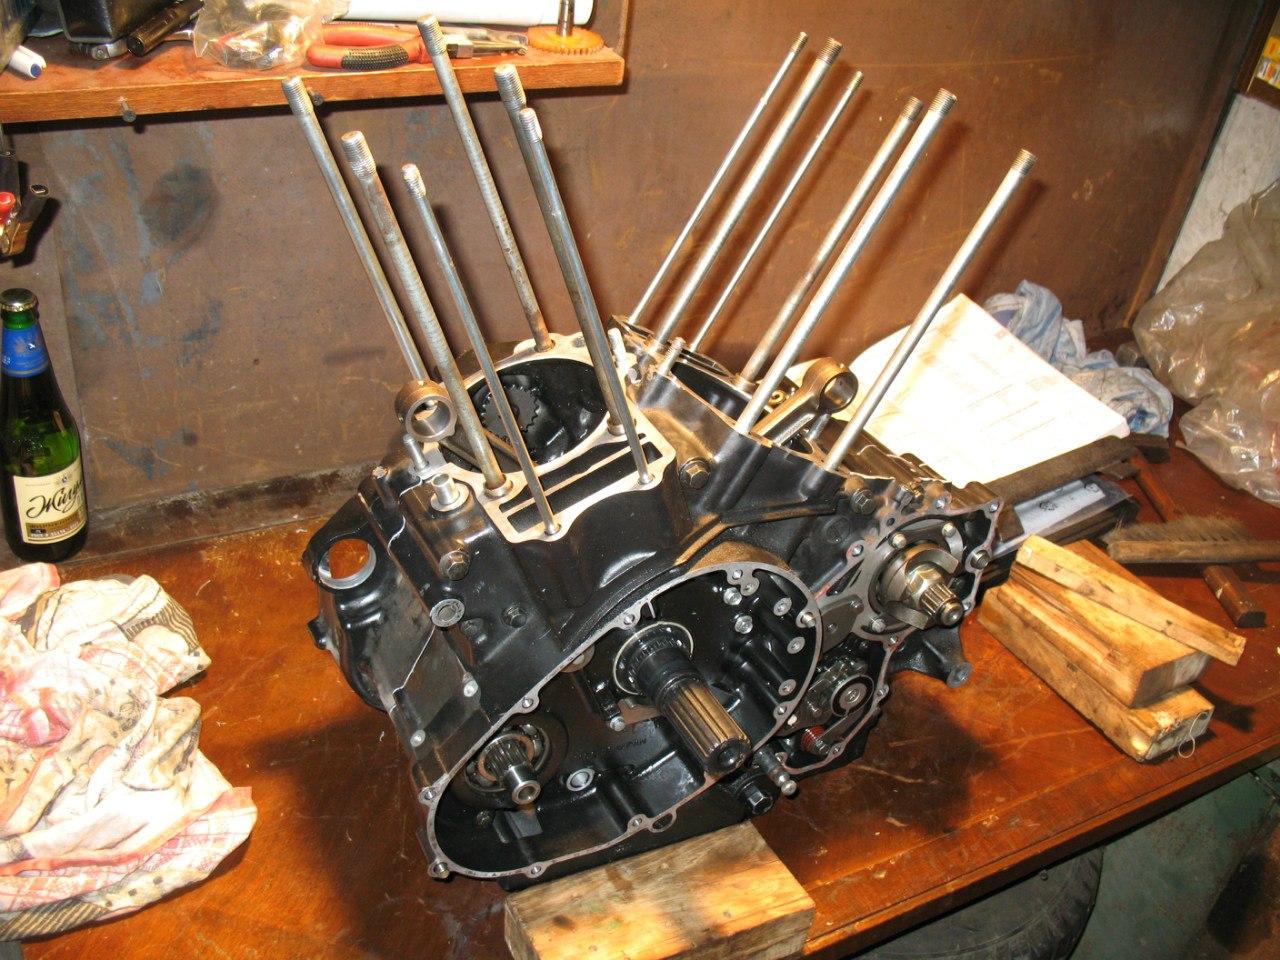 Блог им. Mrak2: разборка-сборка мотора 1996 Kawasaki VN-1500D1 Vulcan Classic